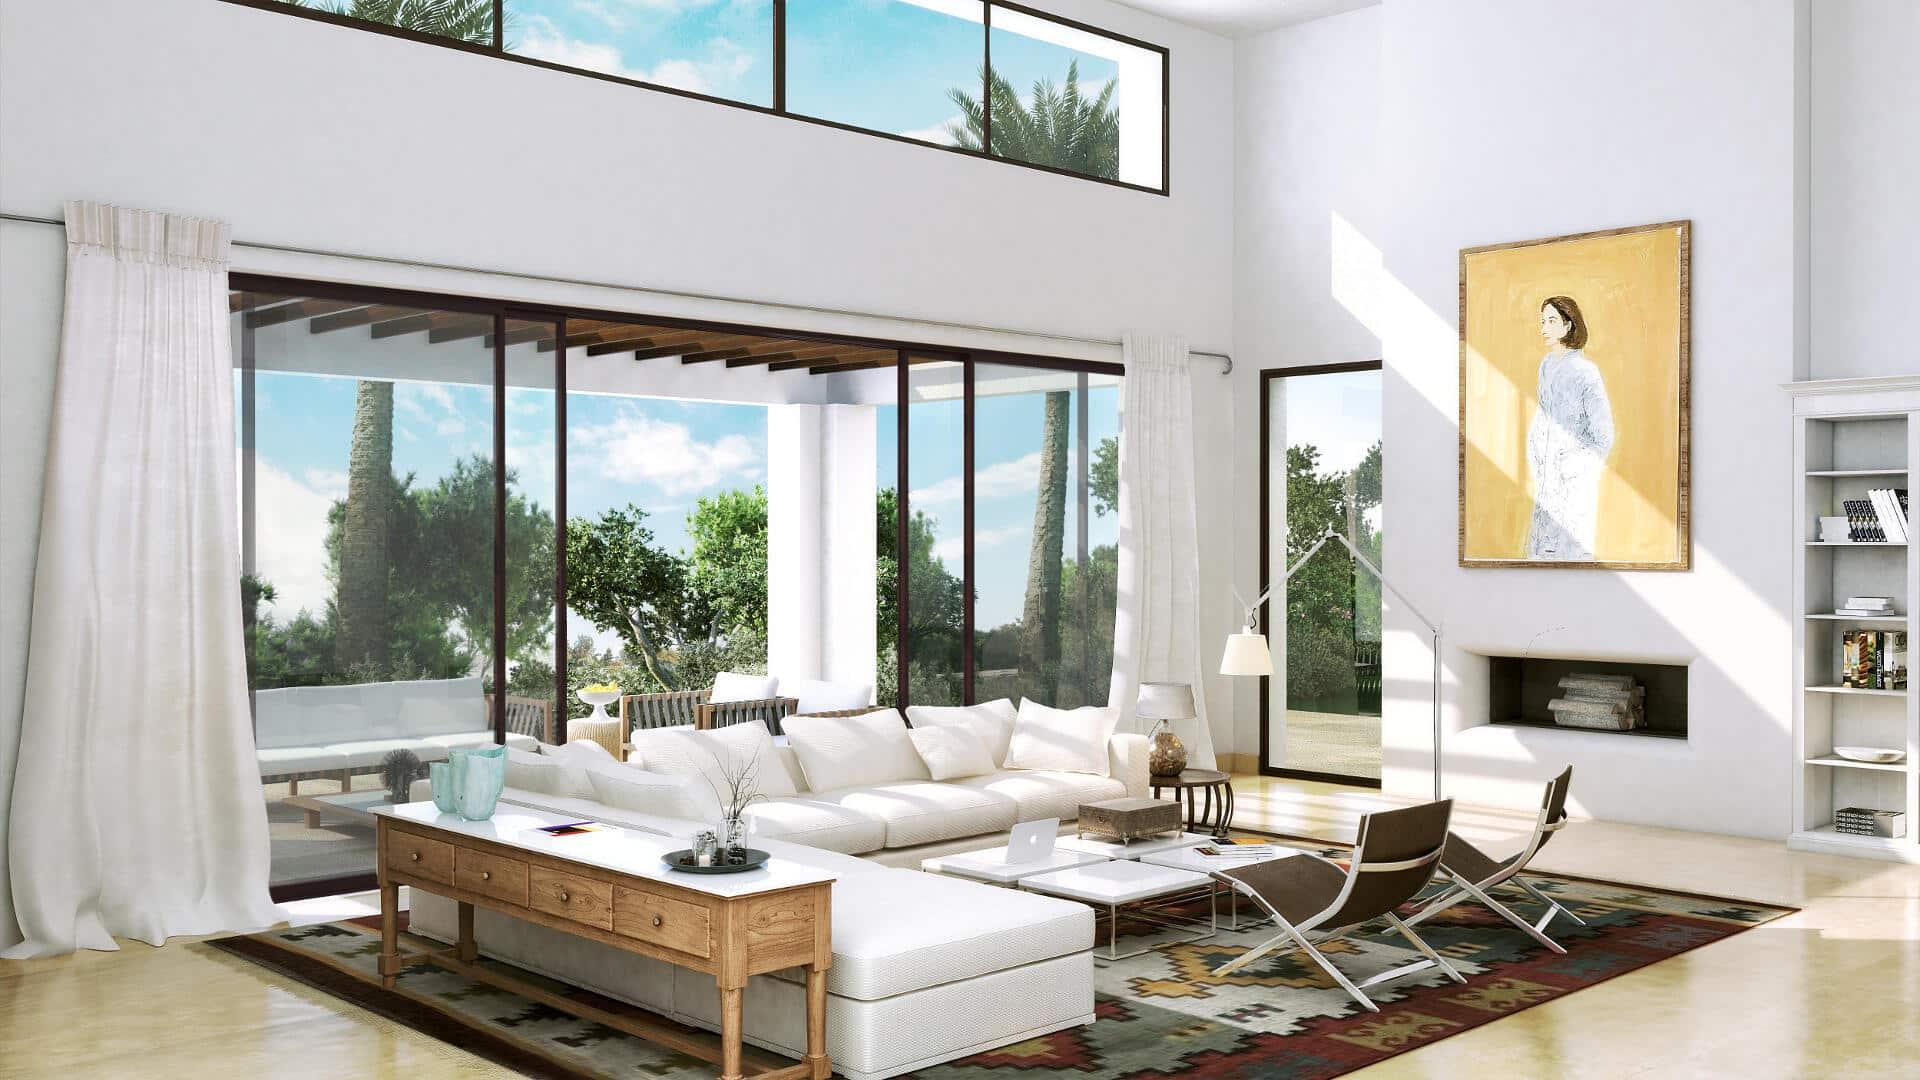 GREEN 10 villas Finca Cortesin